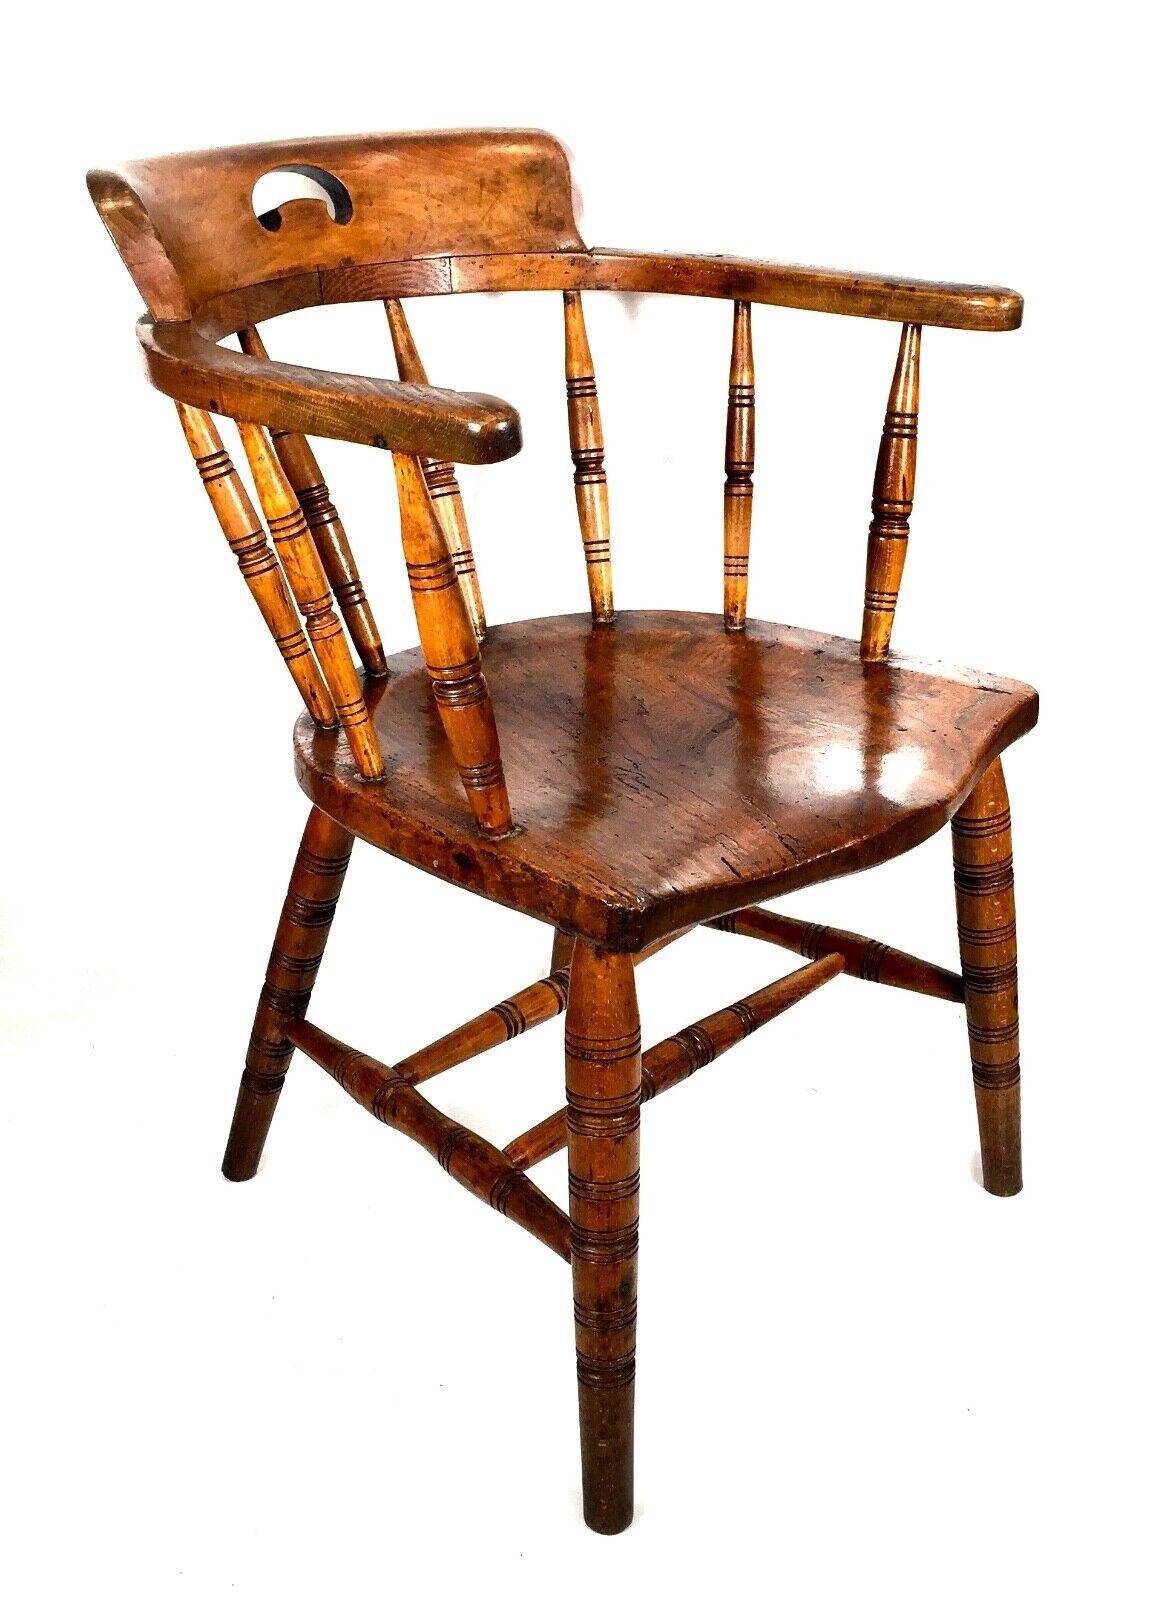 Antique Captain's Elm Bow Seat Smokers Chair / Desk Seat / Armchair c.1850